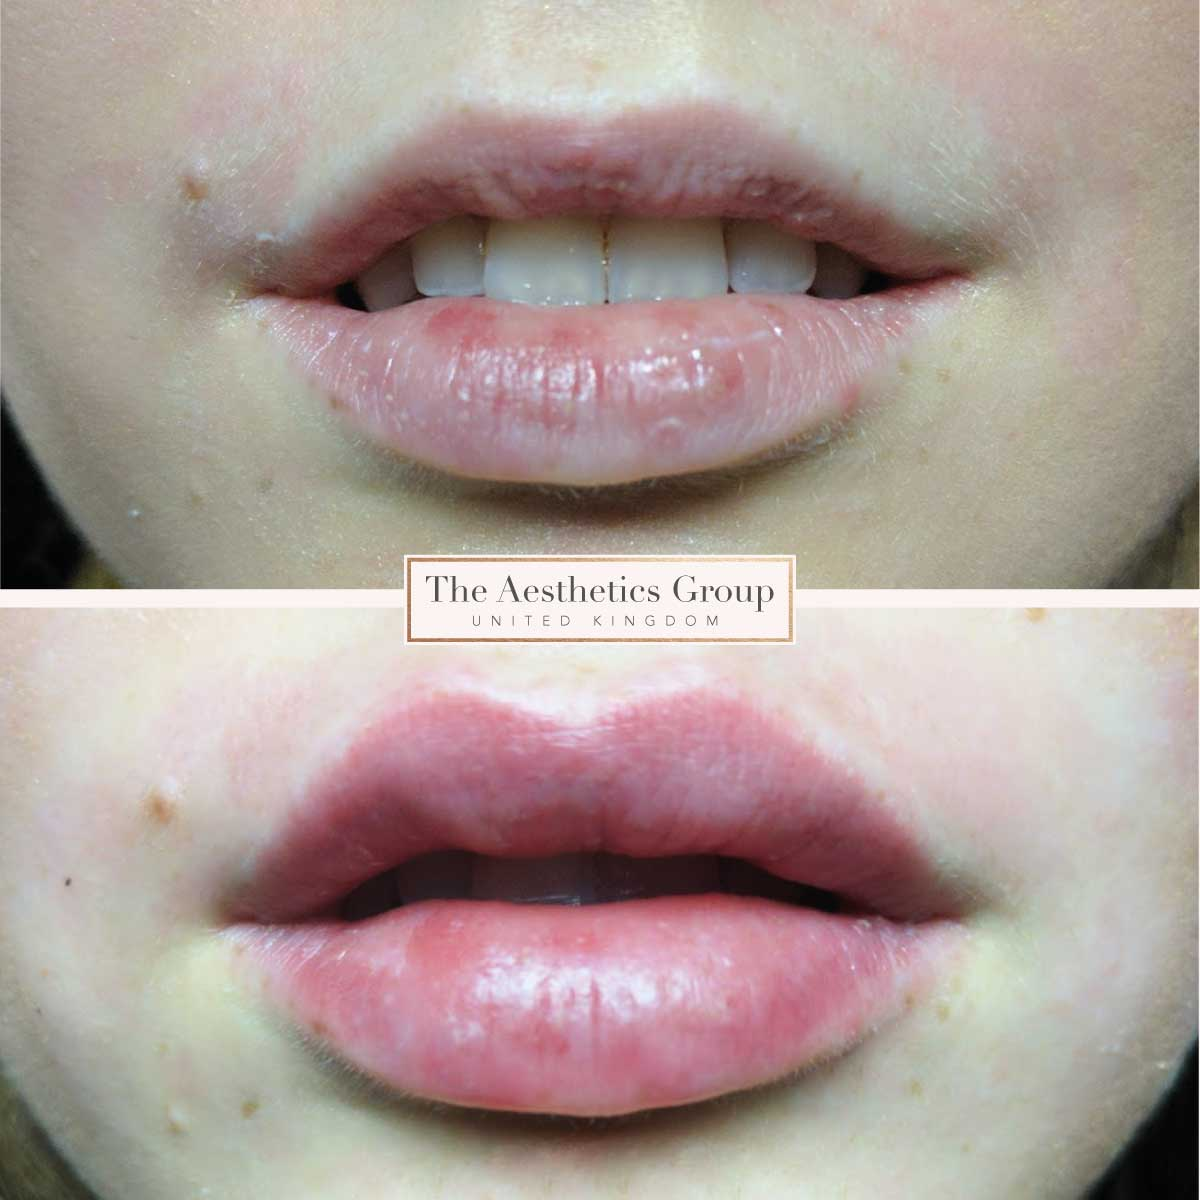 1ml Lip Fillers